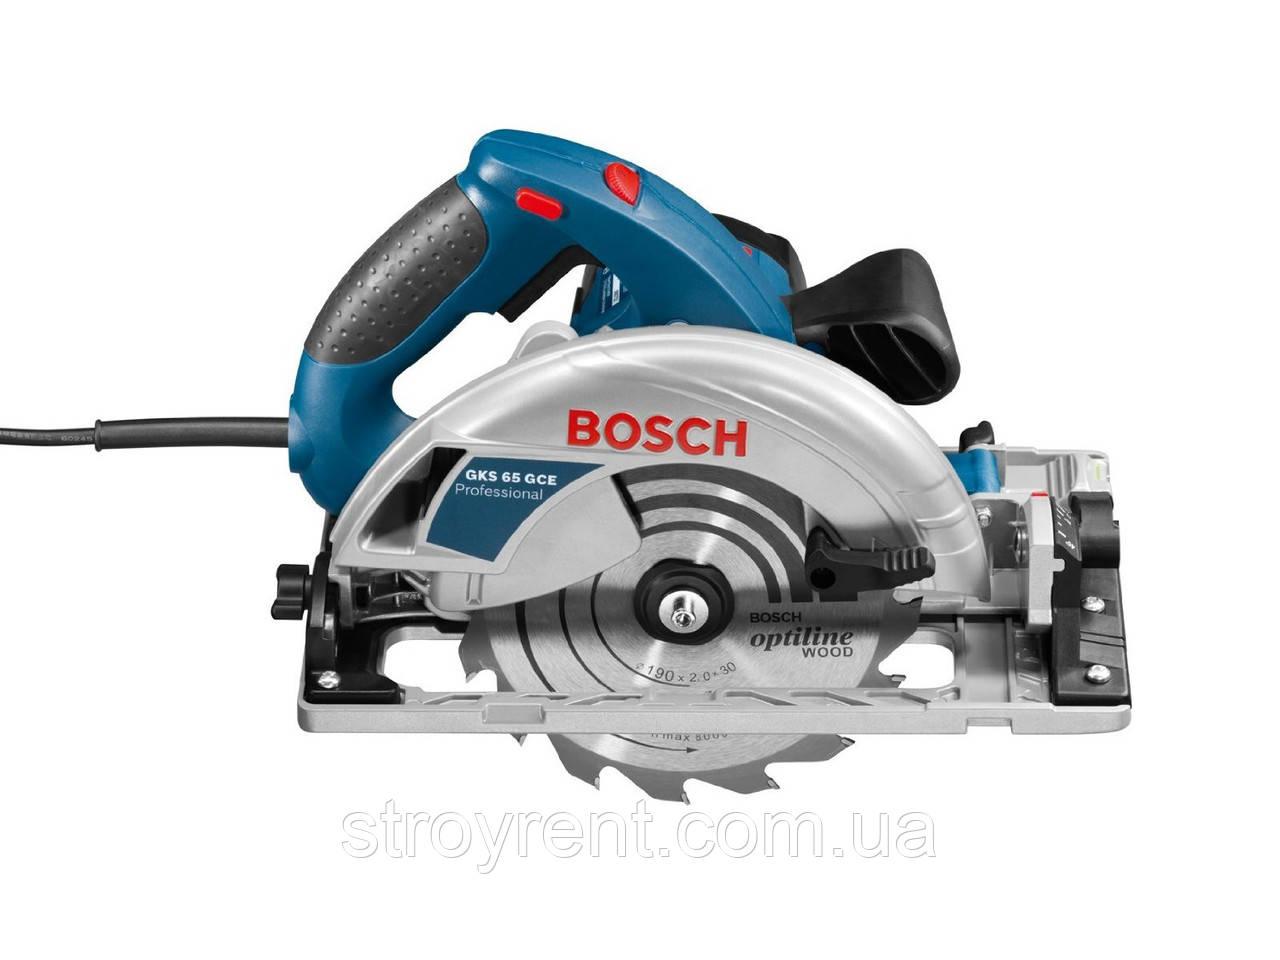 Пила дисковая Bosch GKS 65 GCE  - аренда, прокат